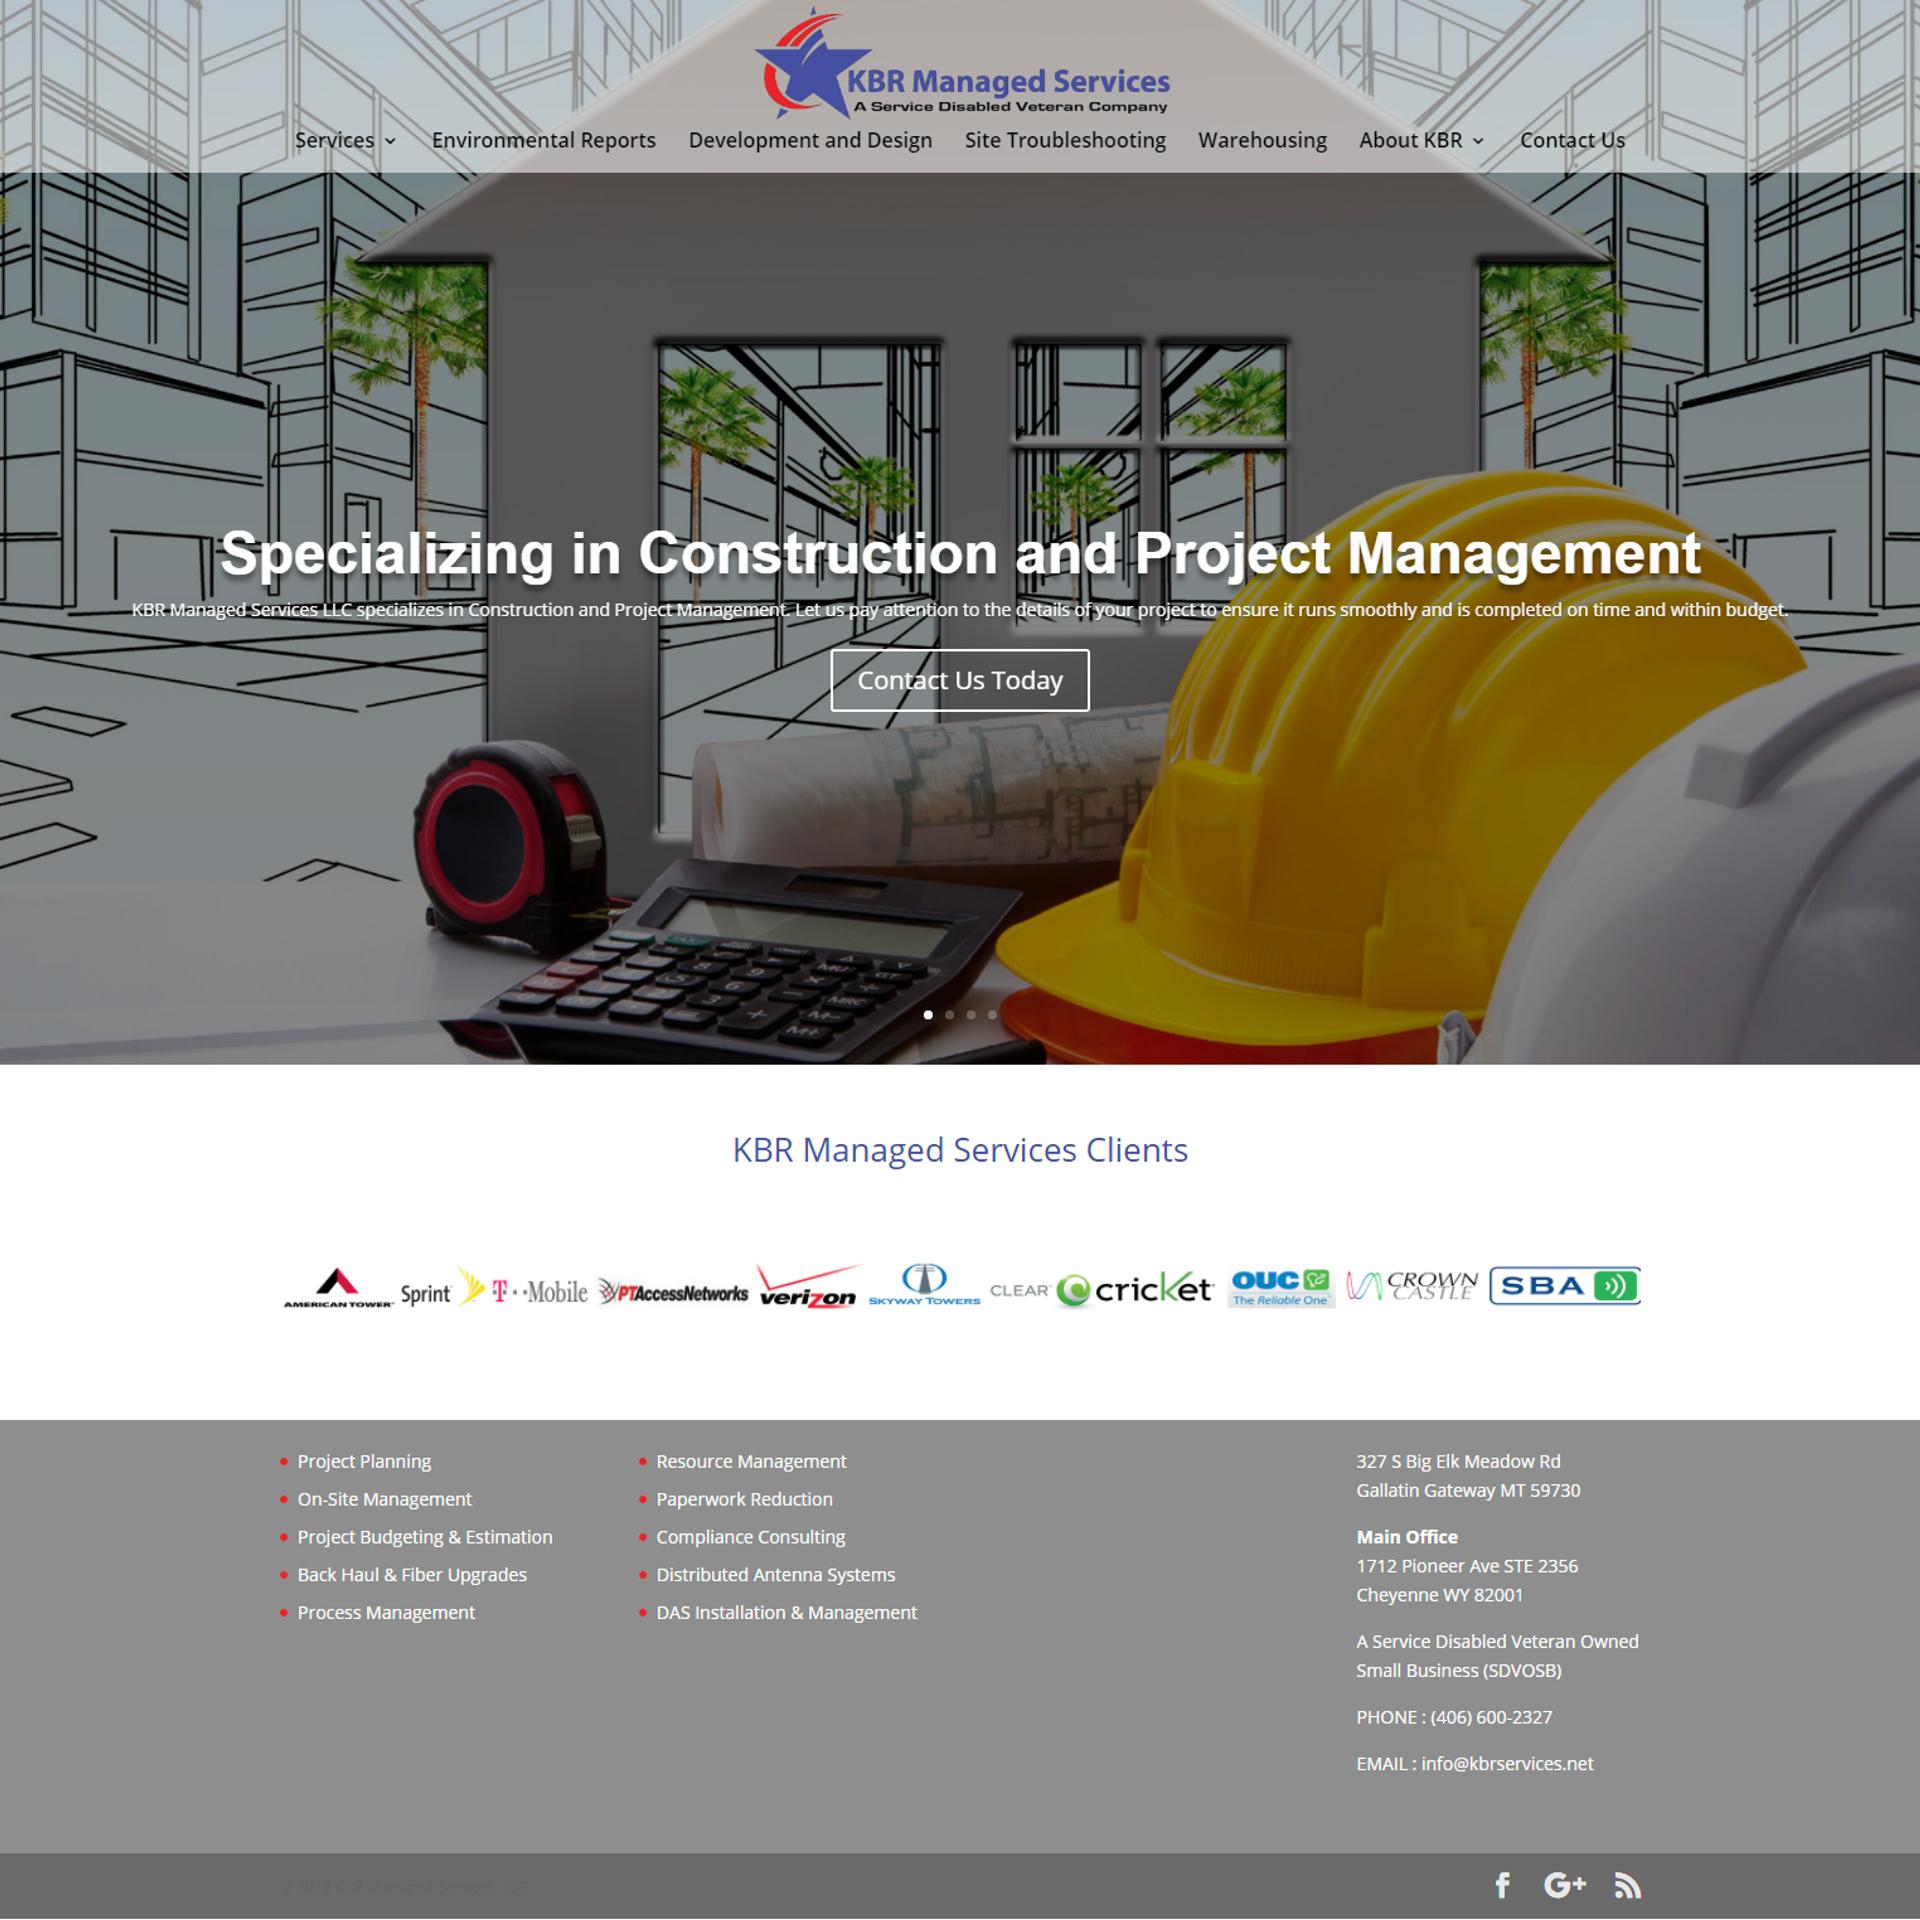 KBR Managed Services Website Design and Development